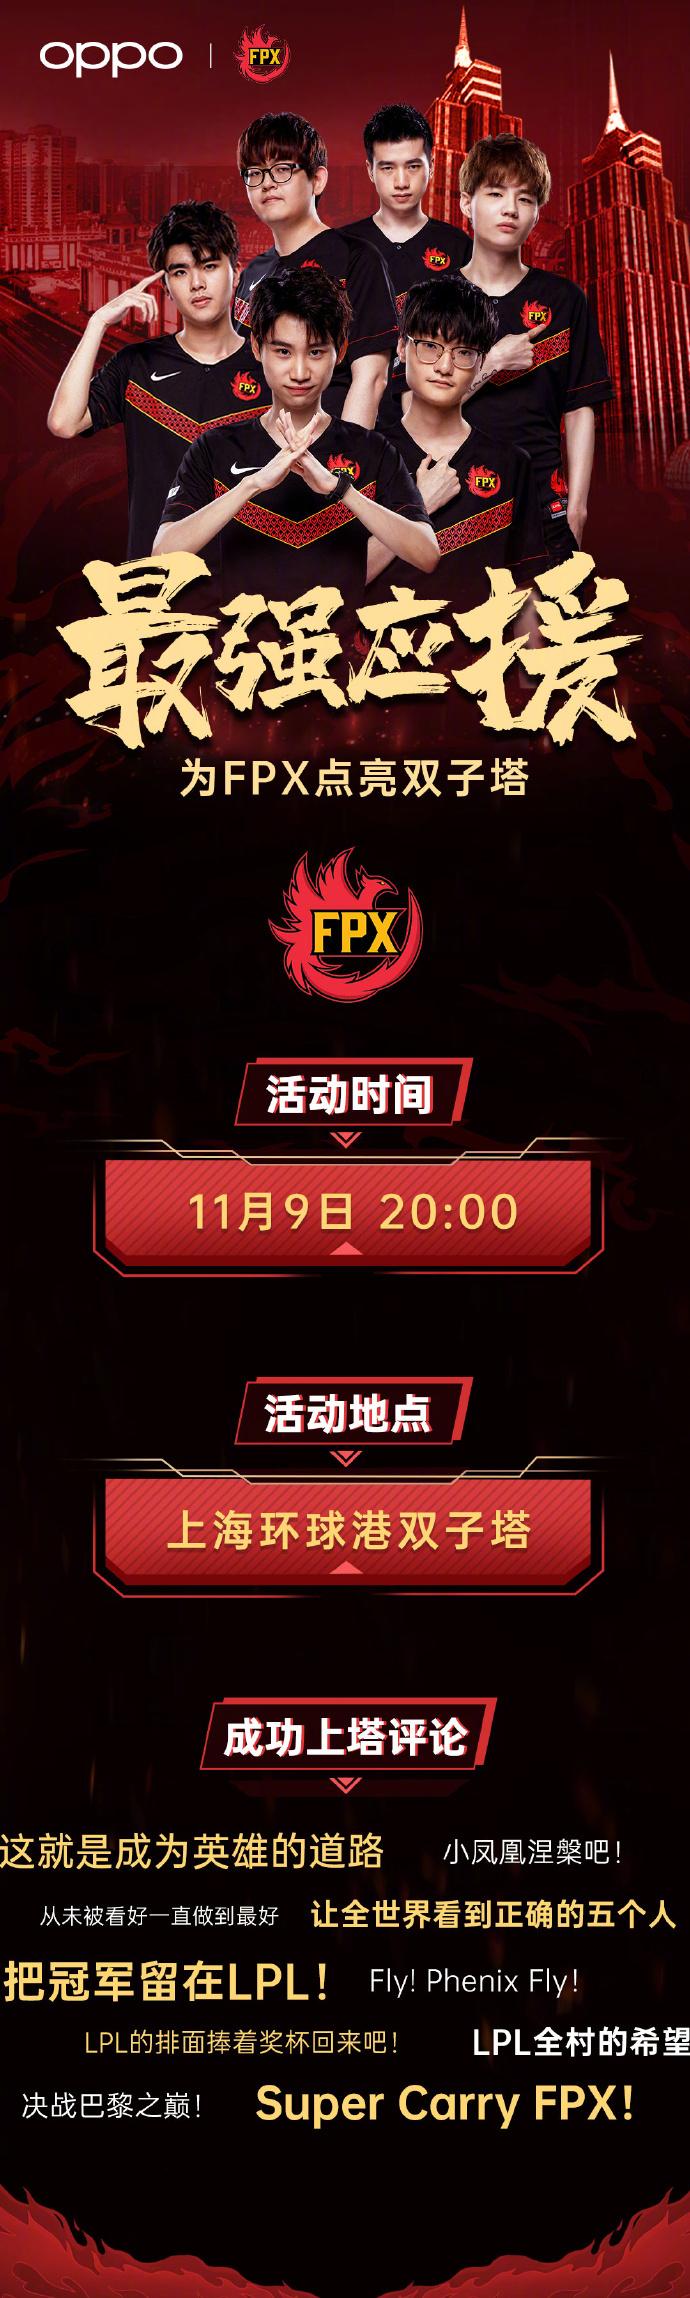 OPPO宣布:今晚将为《英雄联盟》FPX战队点亮上海环球港双子塔_Russon